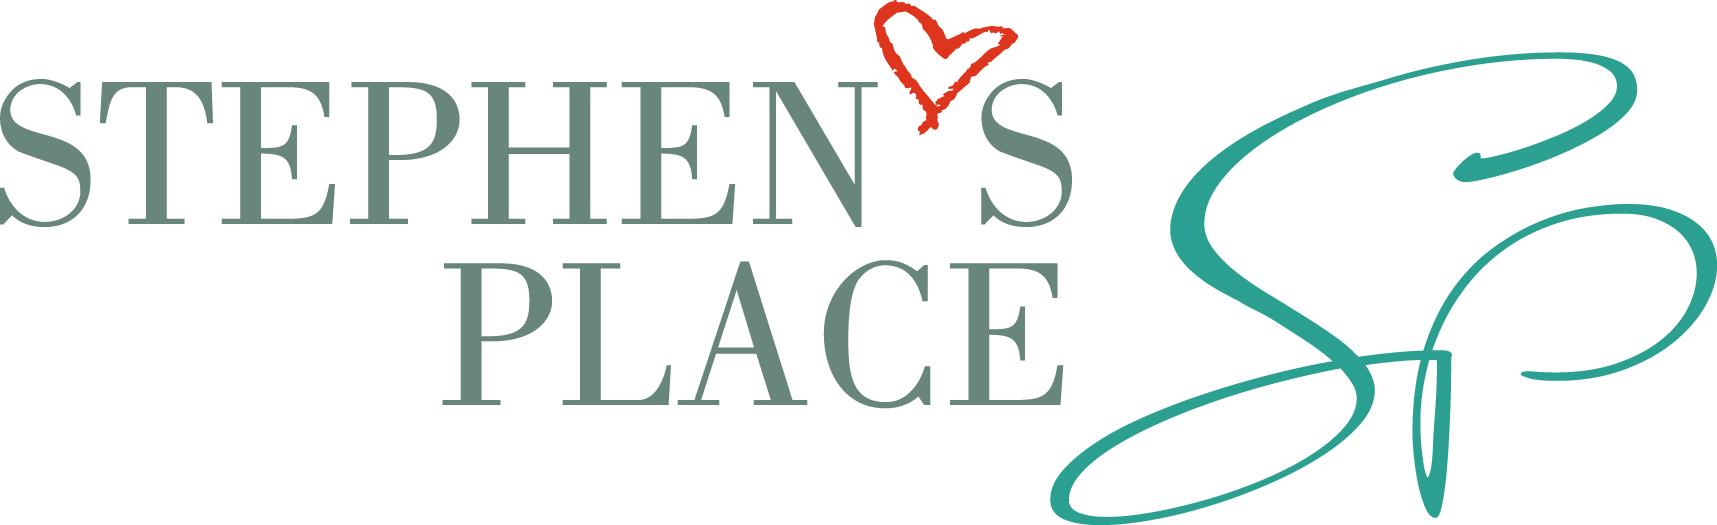 media/2017 StephensPlace logo.jpg